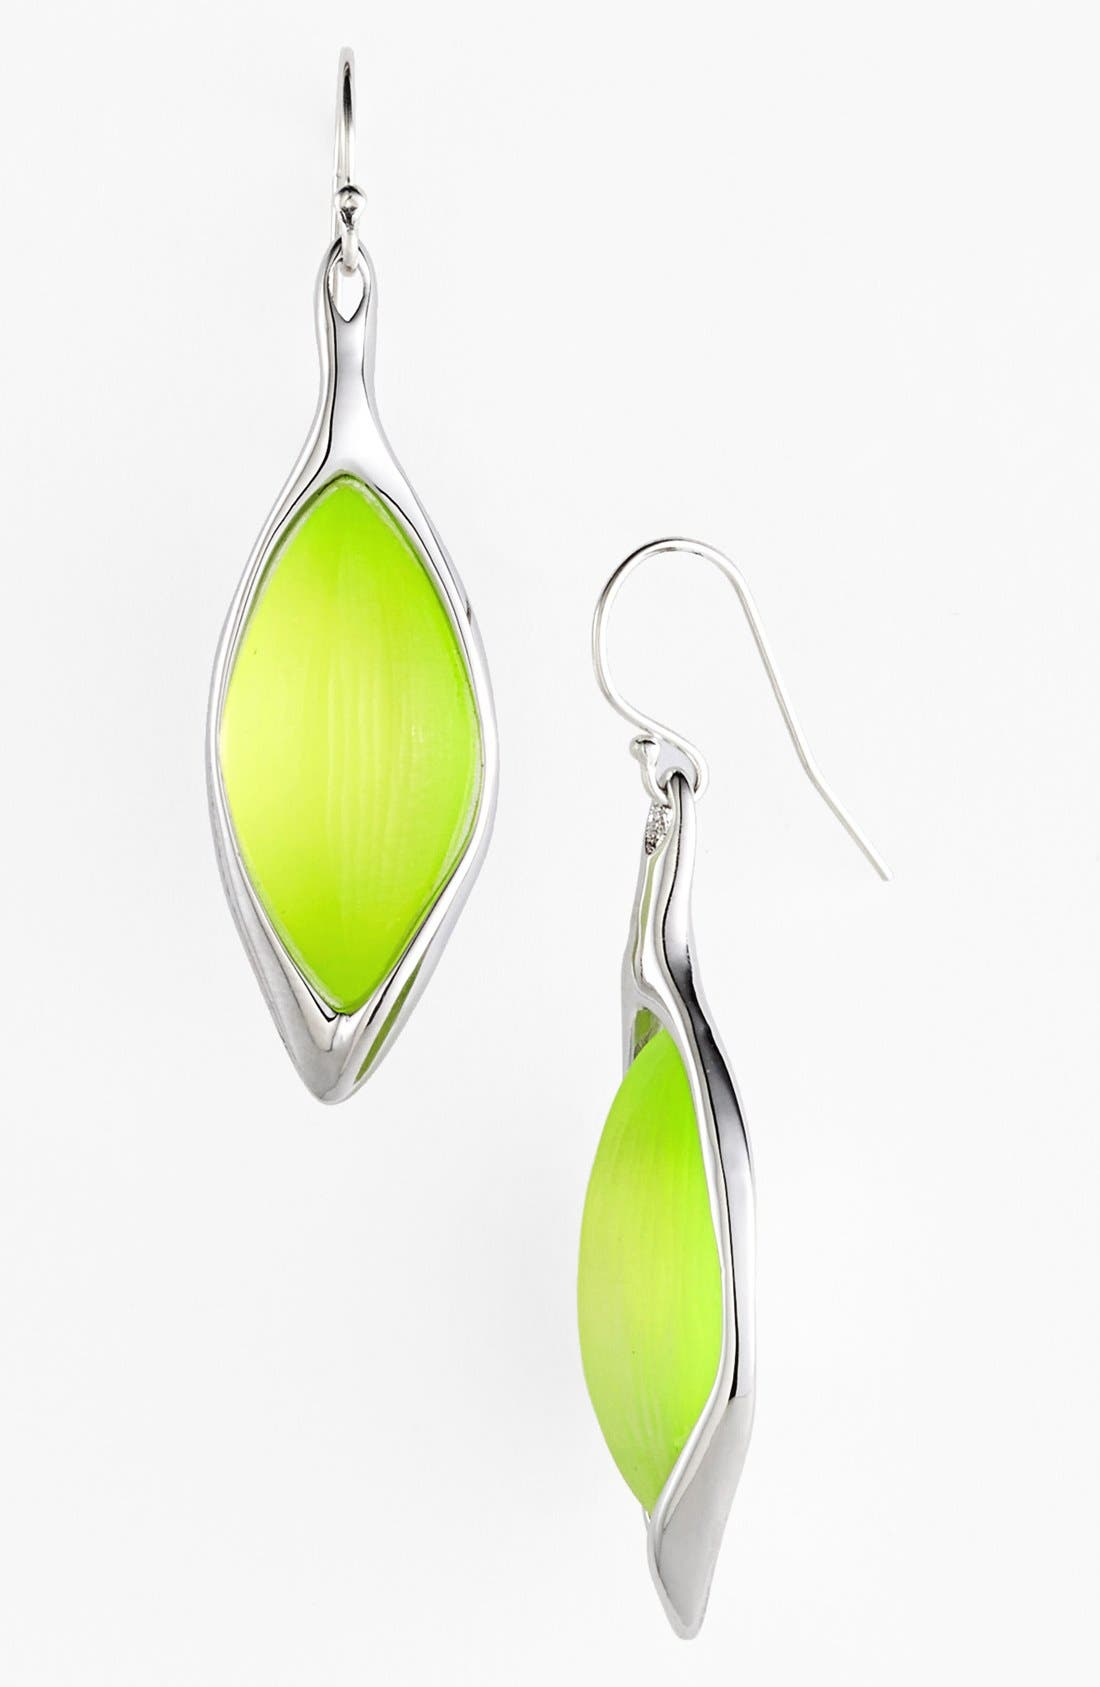 Alternate Image 1 Selected - Alexis Bittar 'Lucite® - Neon Deco' Drop Earrings